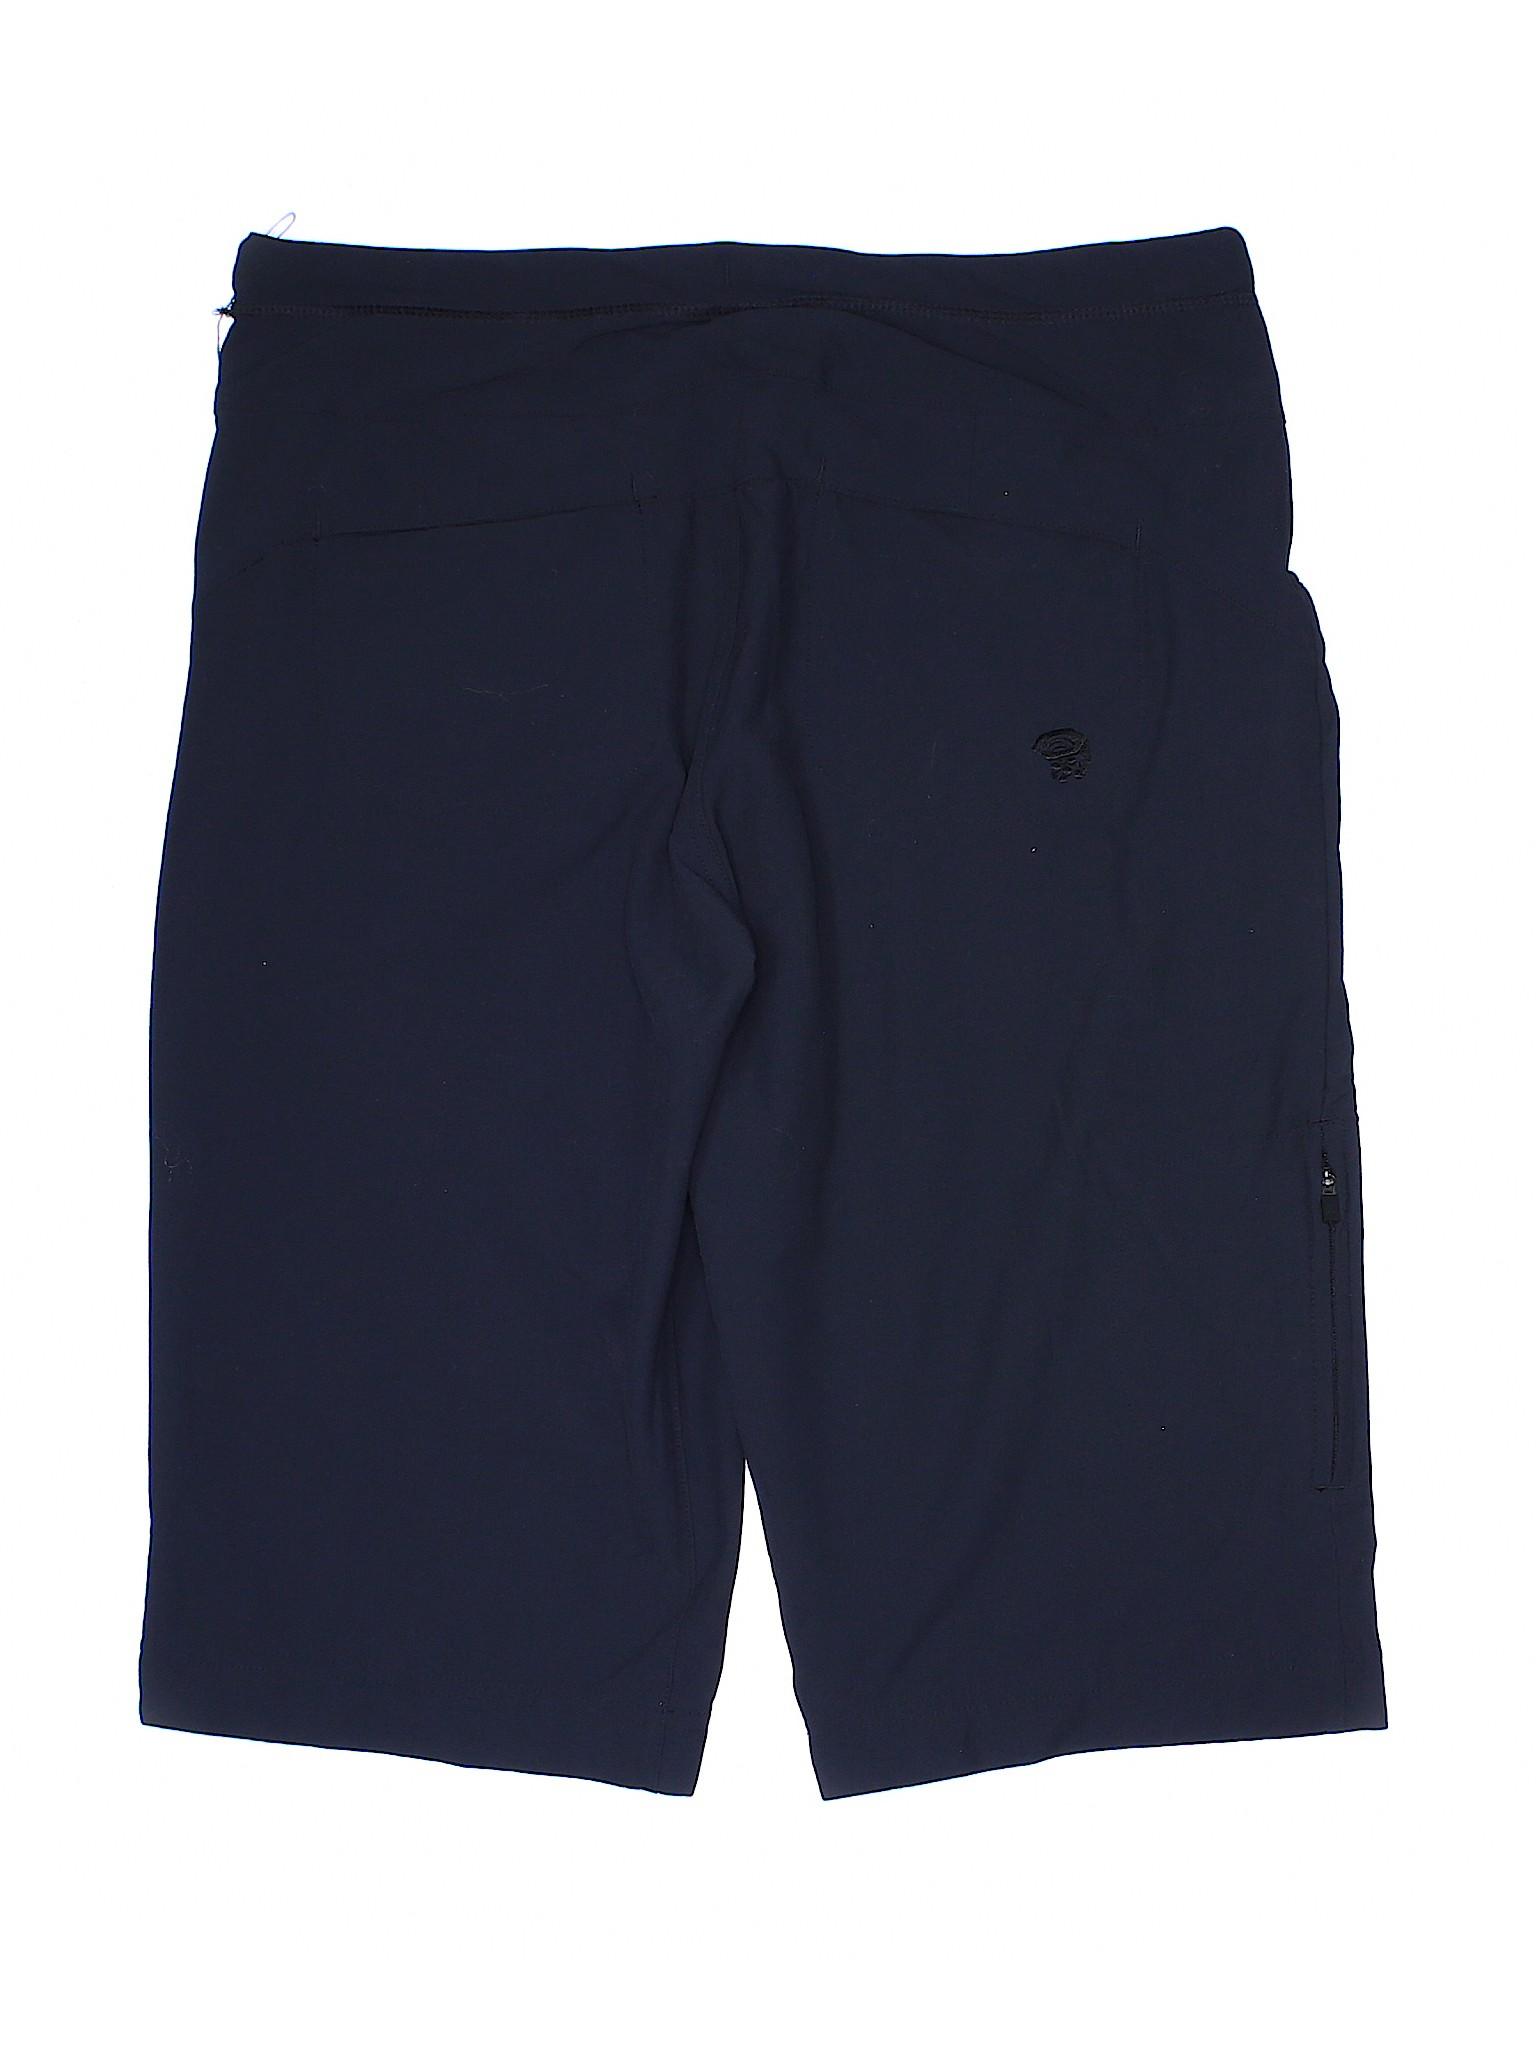 leisure Mountain Shorts Athletic Hardwear Boutique 7AwHqdA